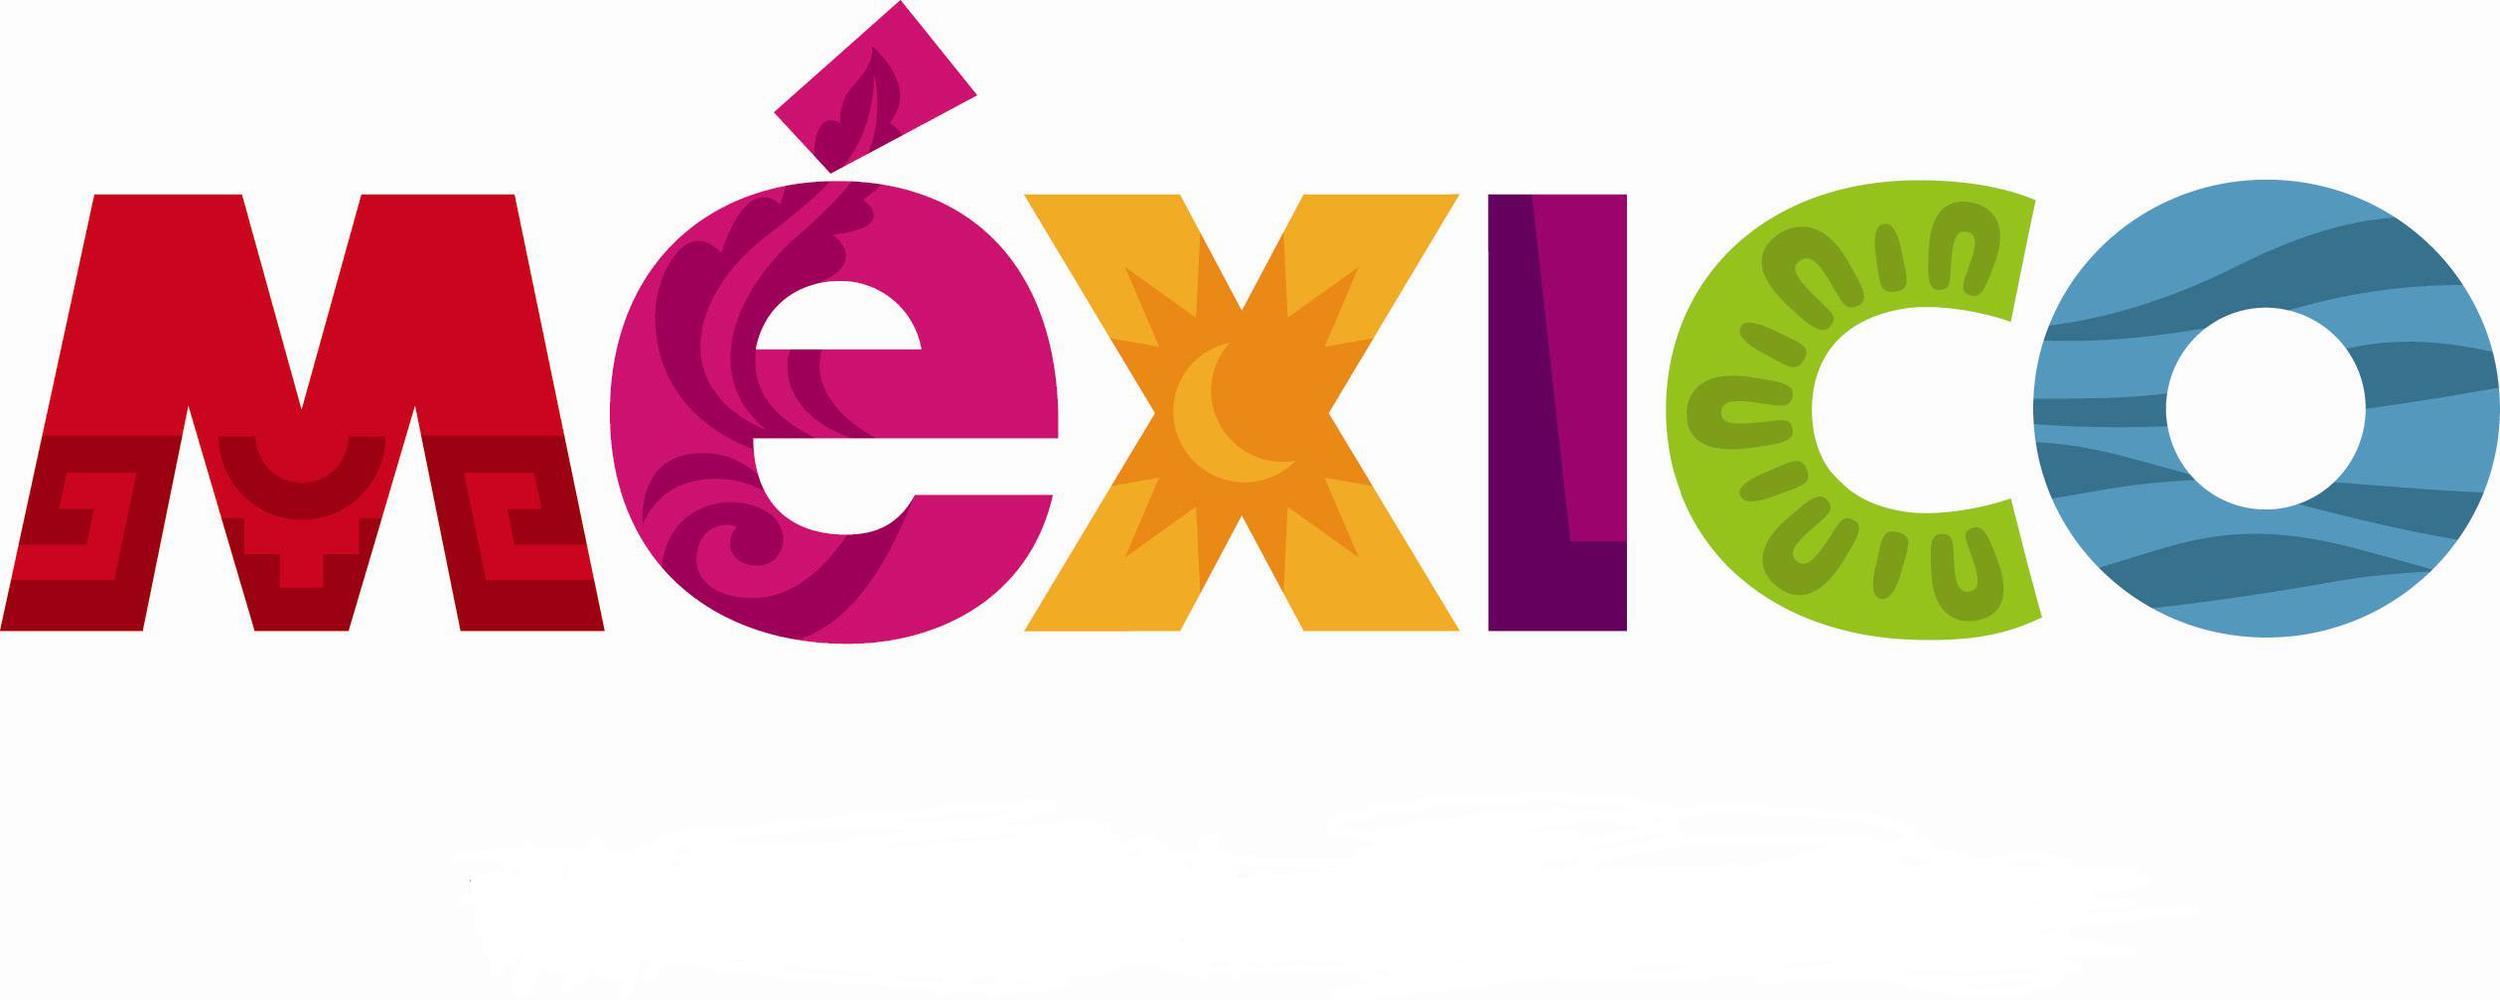 All-Inclusive-Mexico-Holidays-Mexico-Logo.jpg